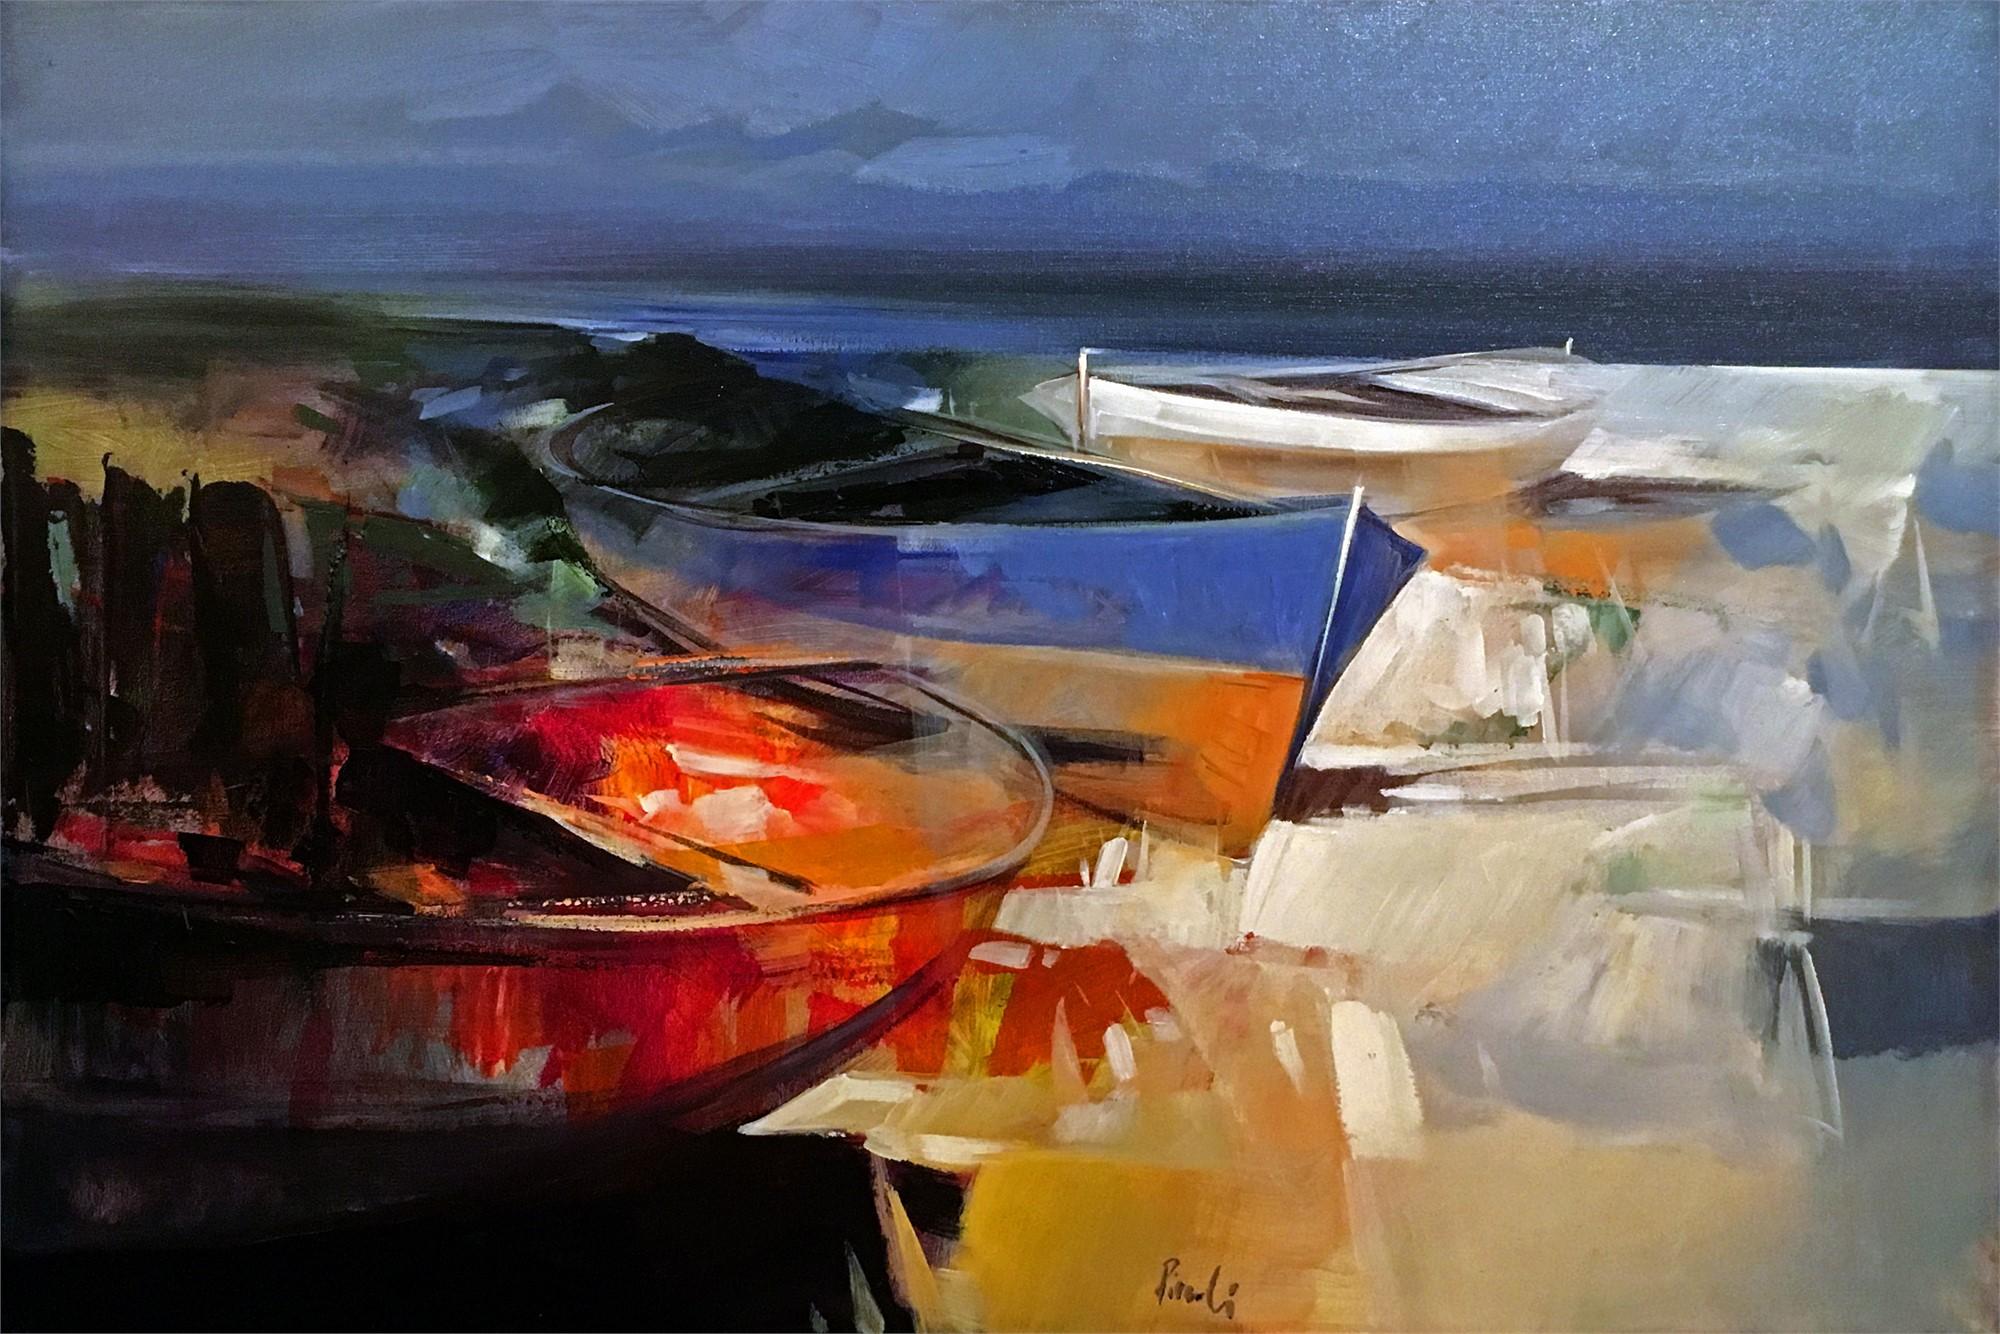 Boats in Stintino, Sardinia by PICCOLI